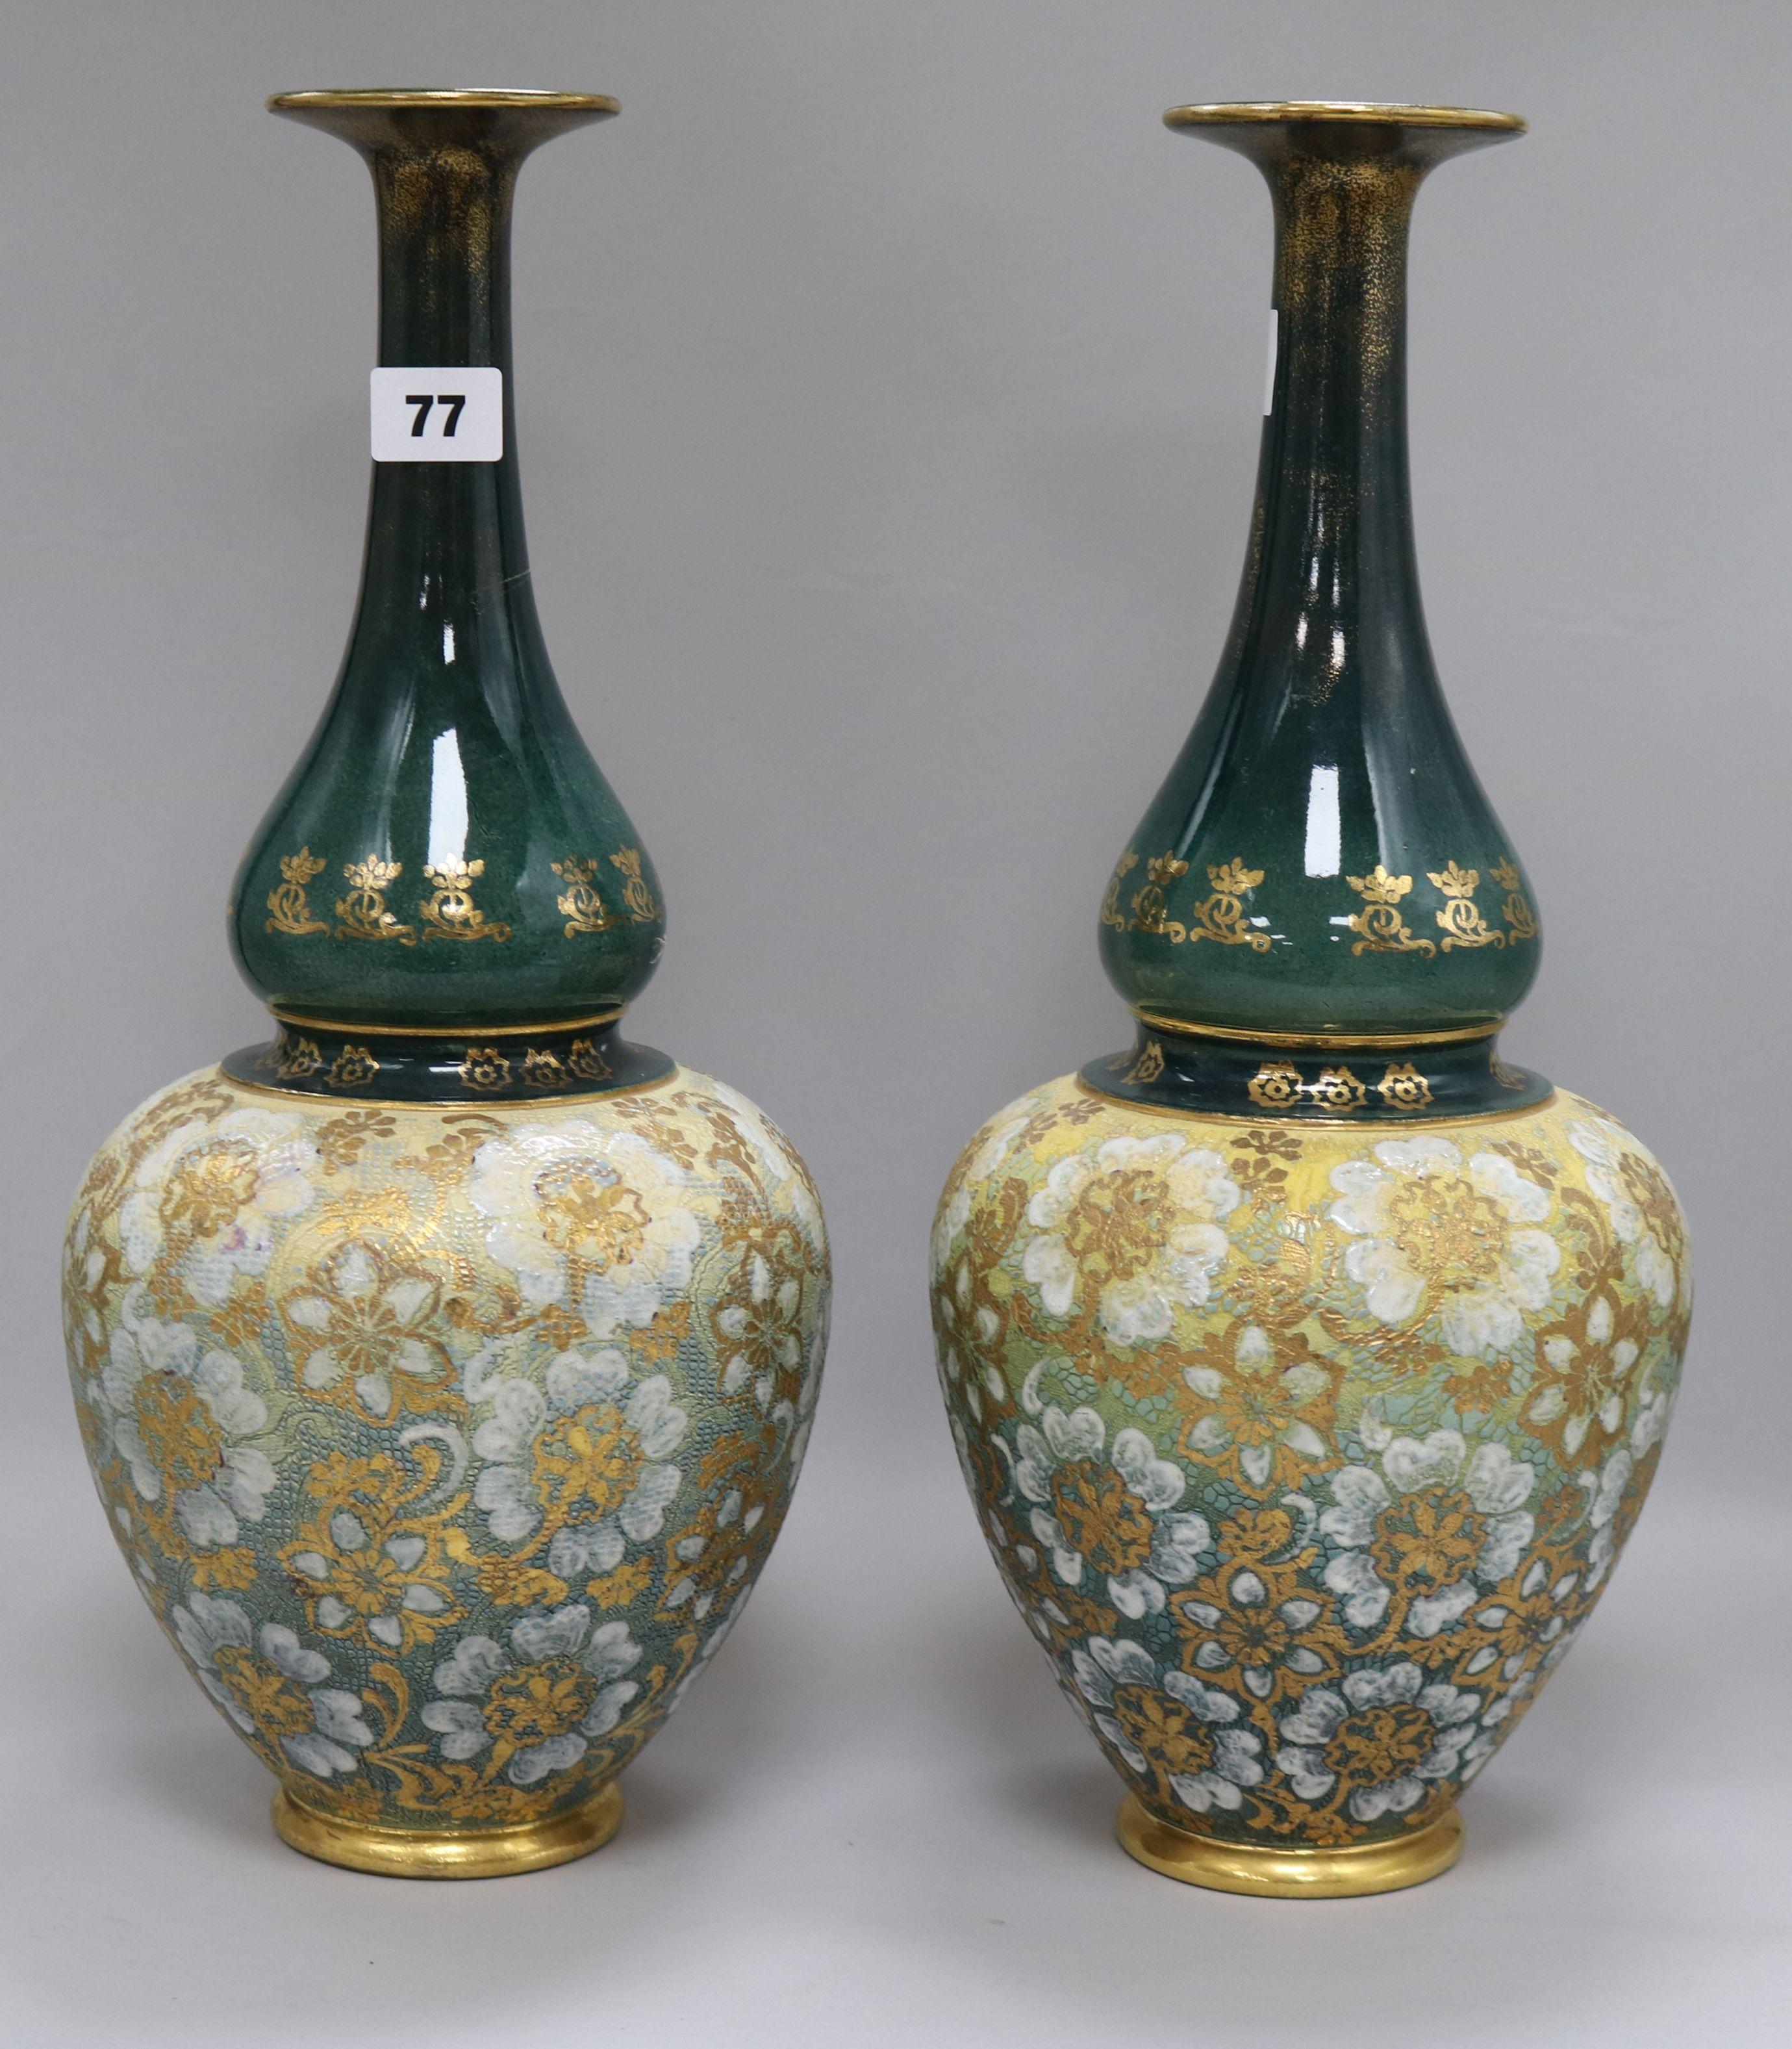 A pair of royal doulton vases h43cm lot 77 a pair of royal doulton vases h43cm reviewsmspy